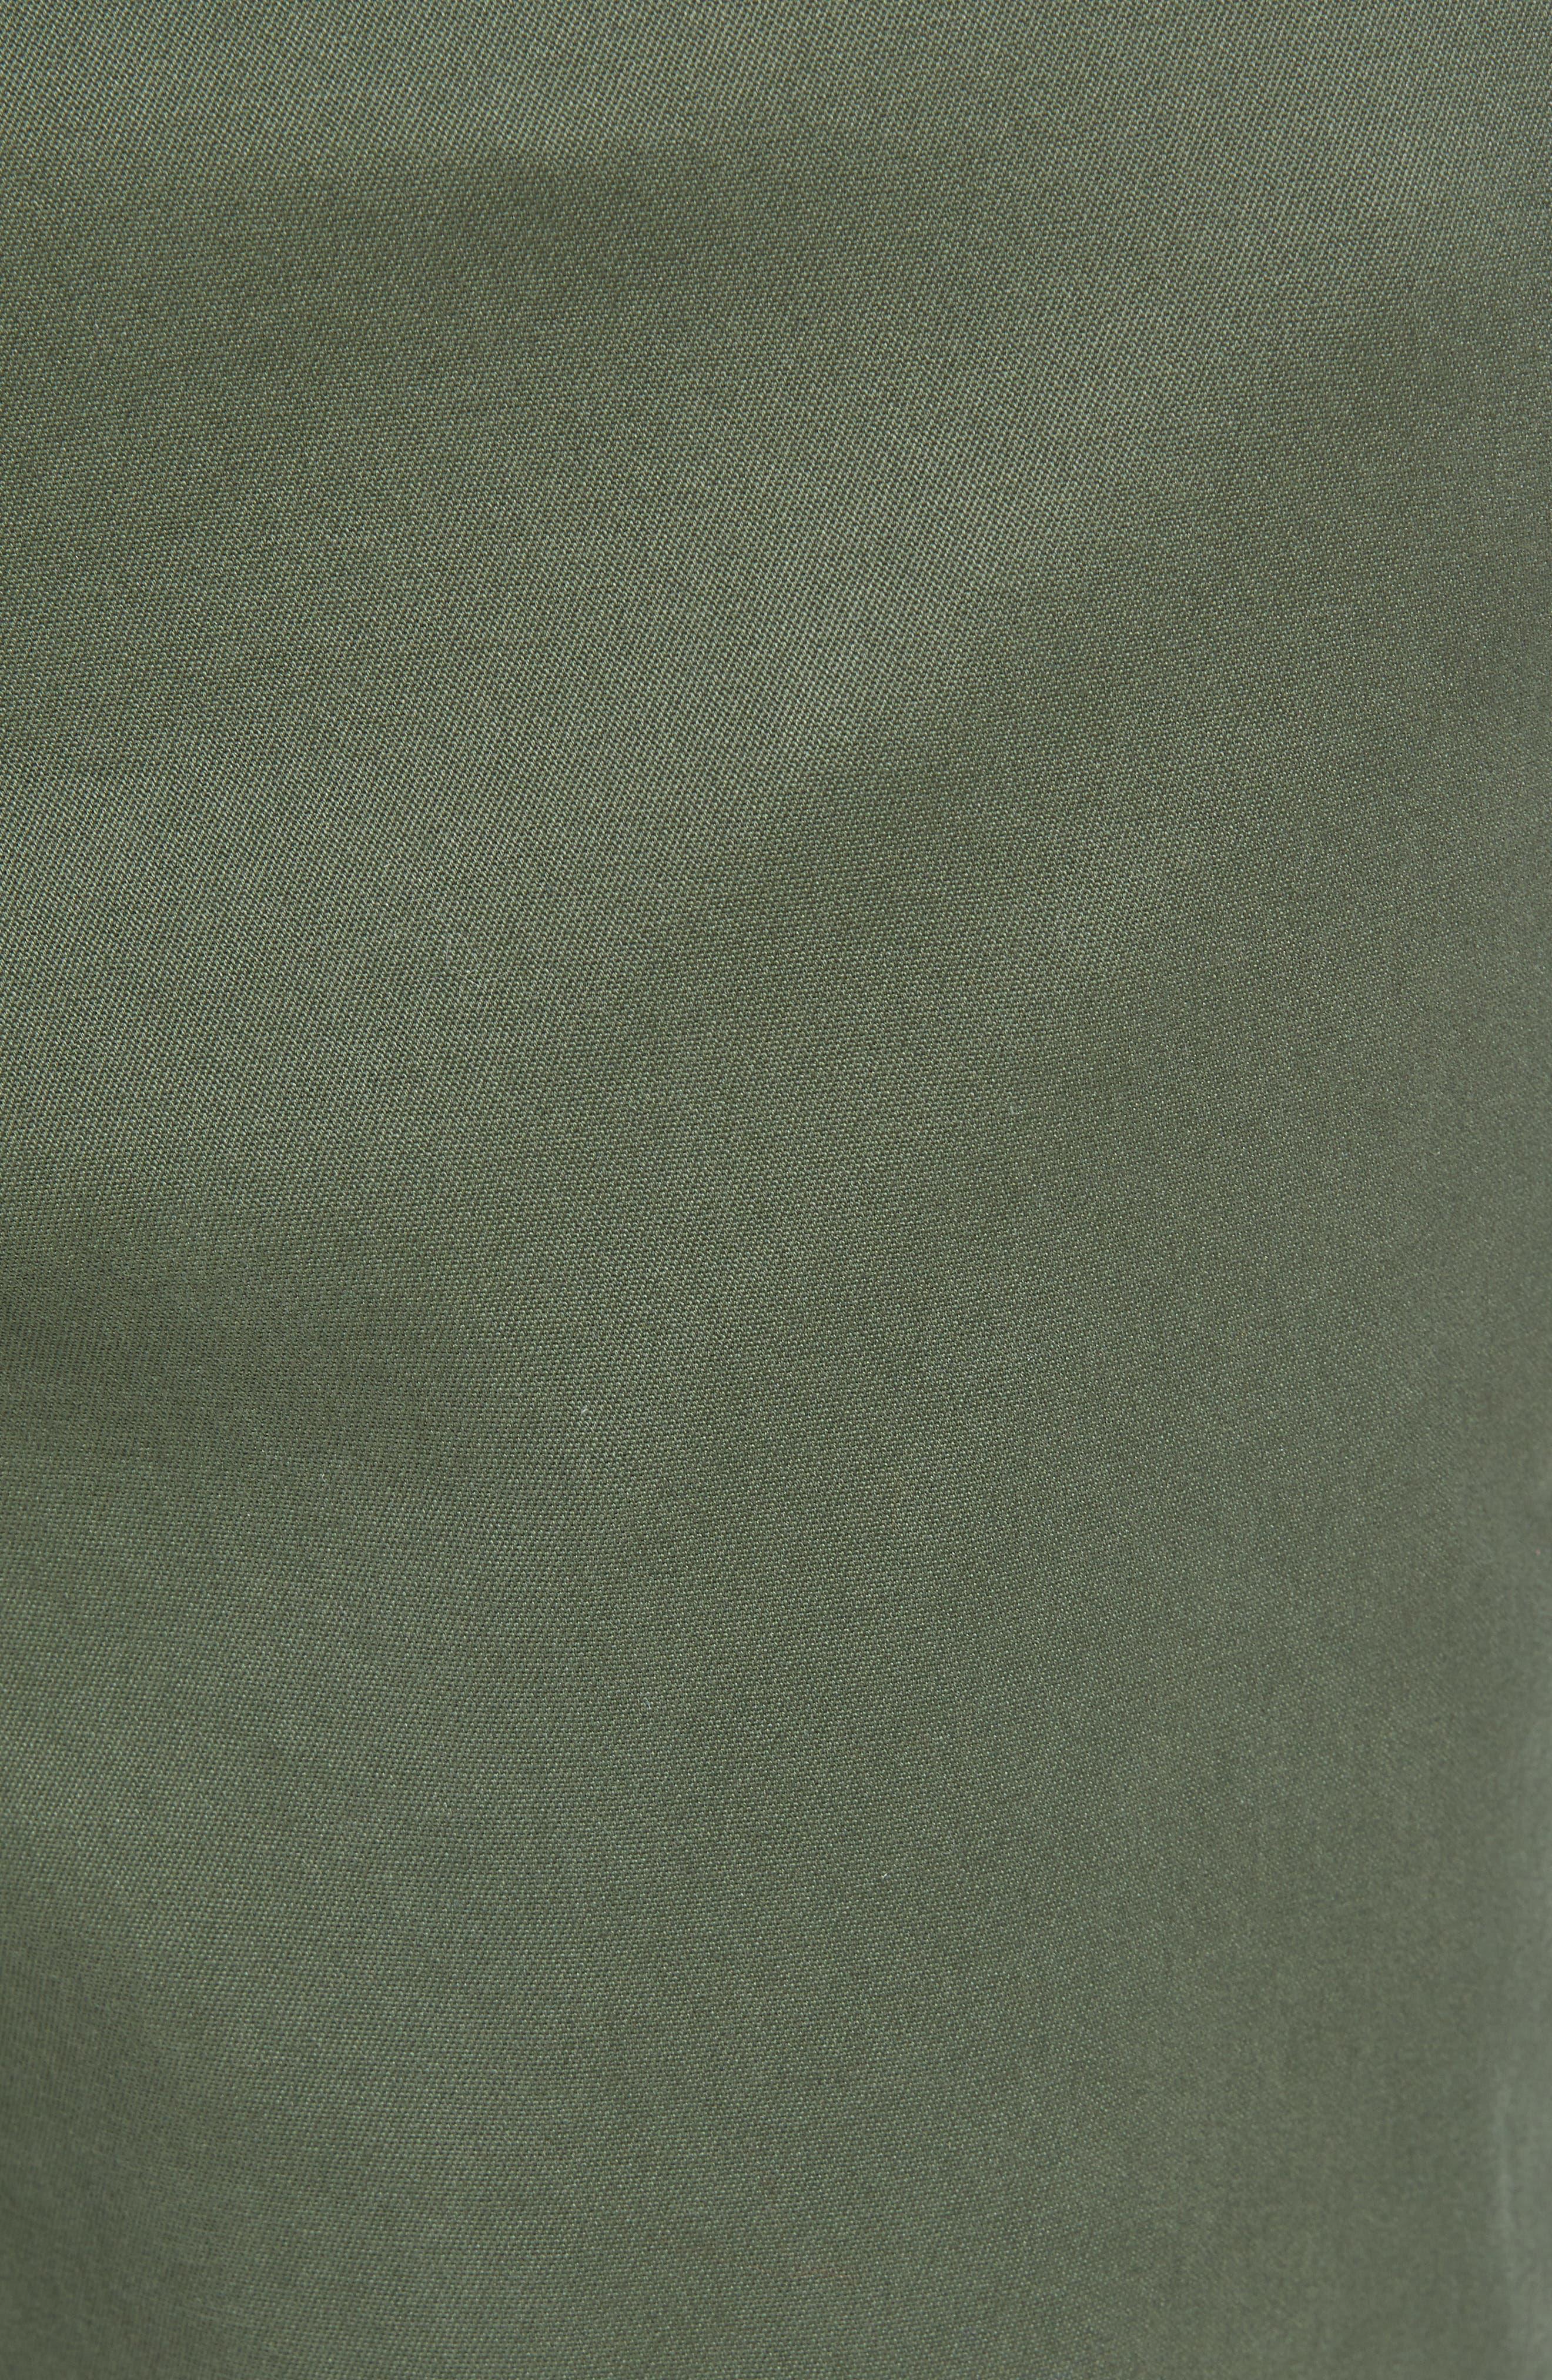 VINEYARD VINES, Breaker Flat Front Stretch Cotton Pants, Alternate thumbnail 6, color, CARGO GREEN